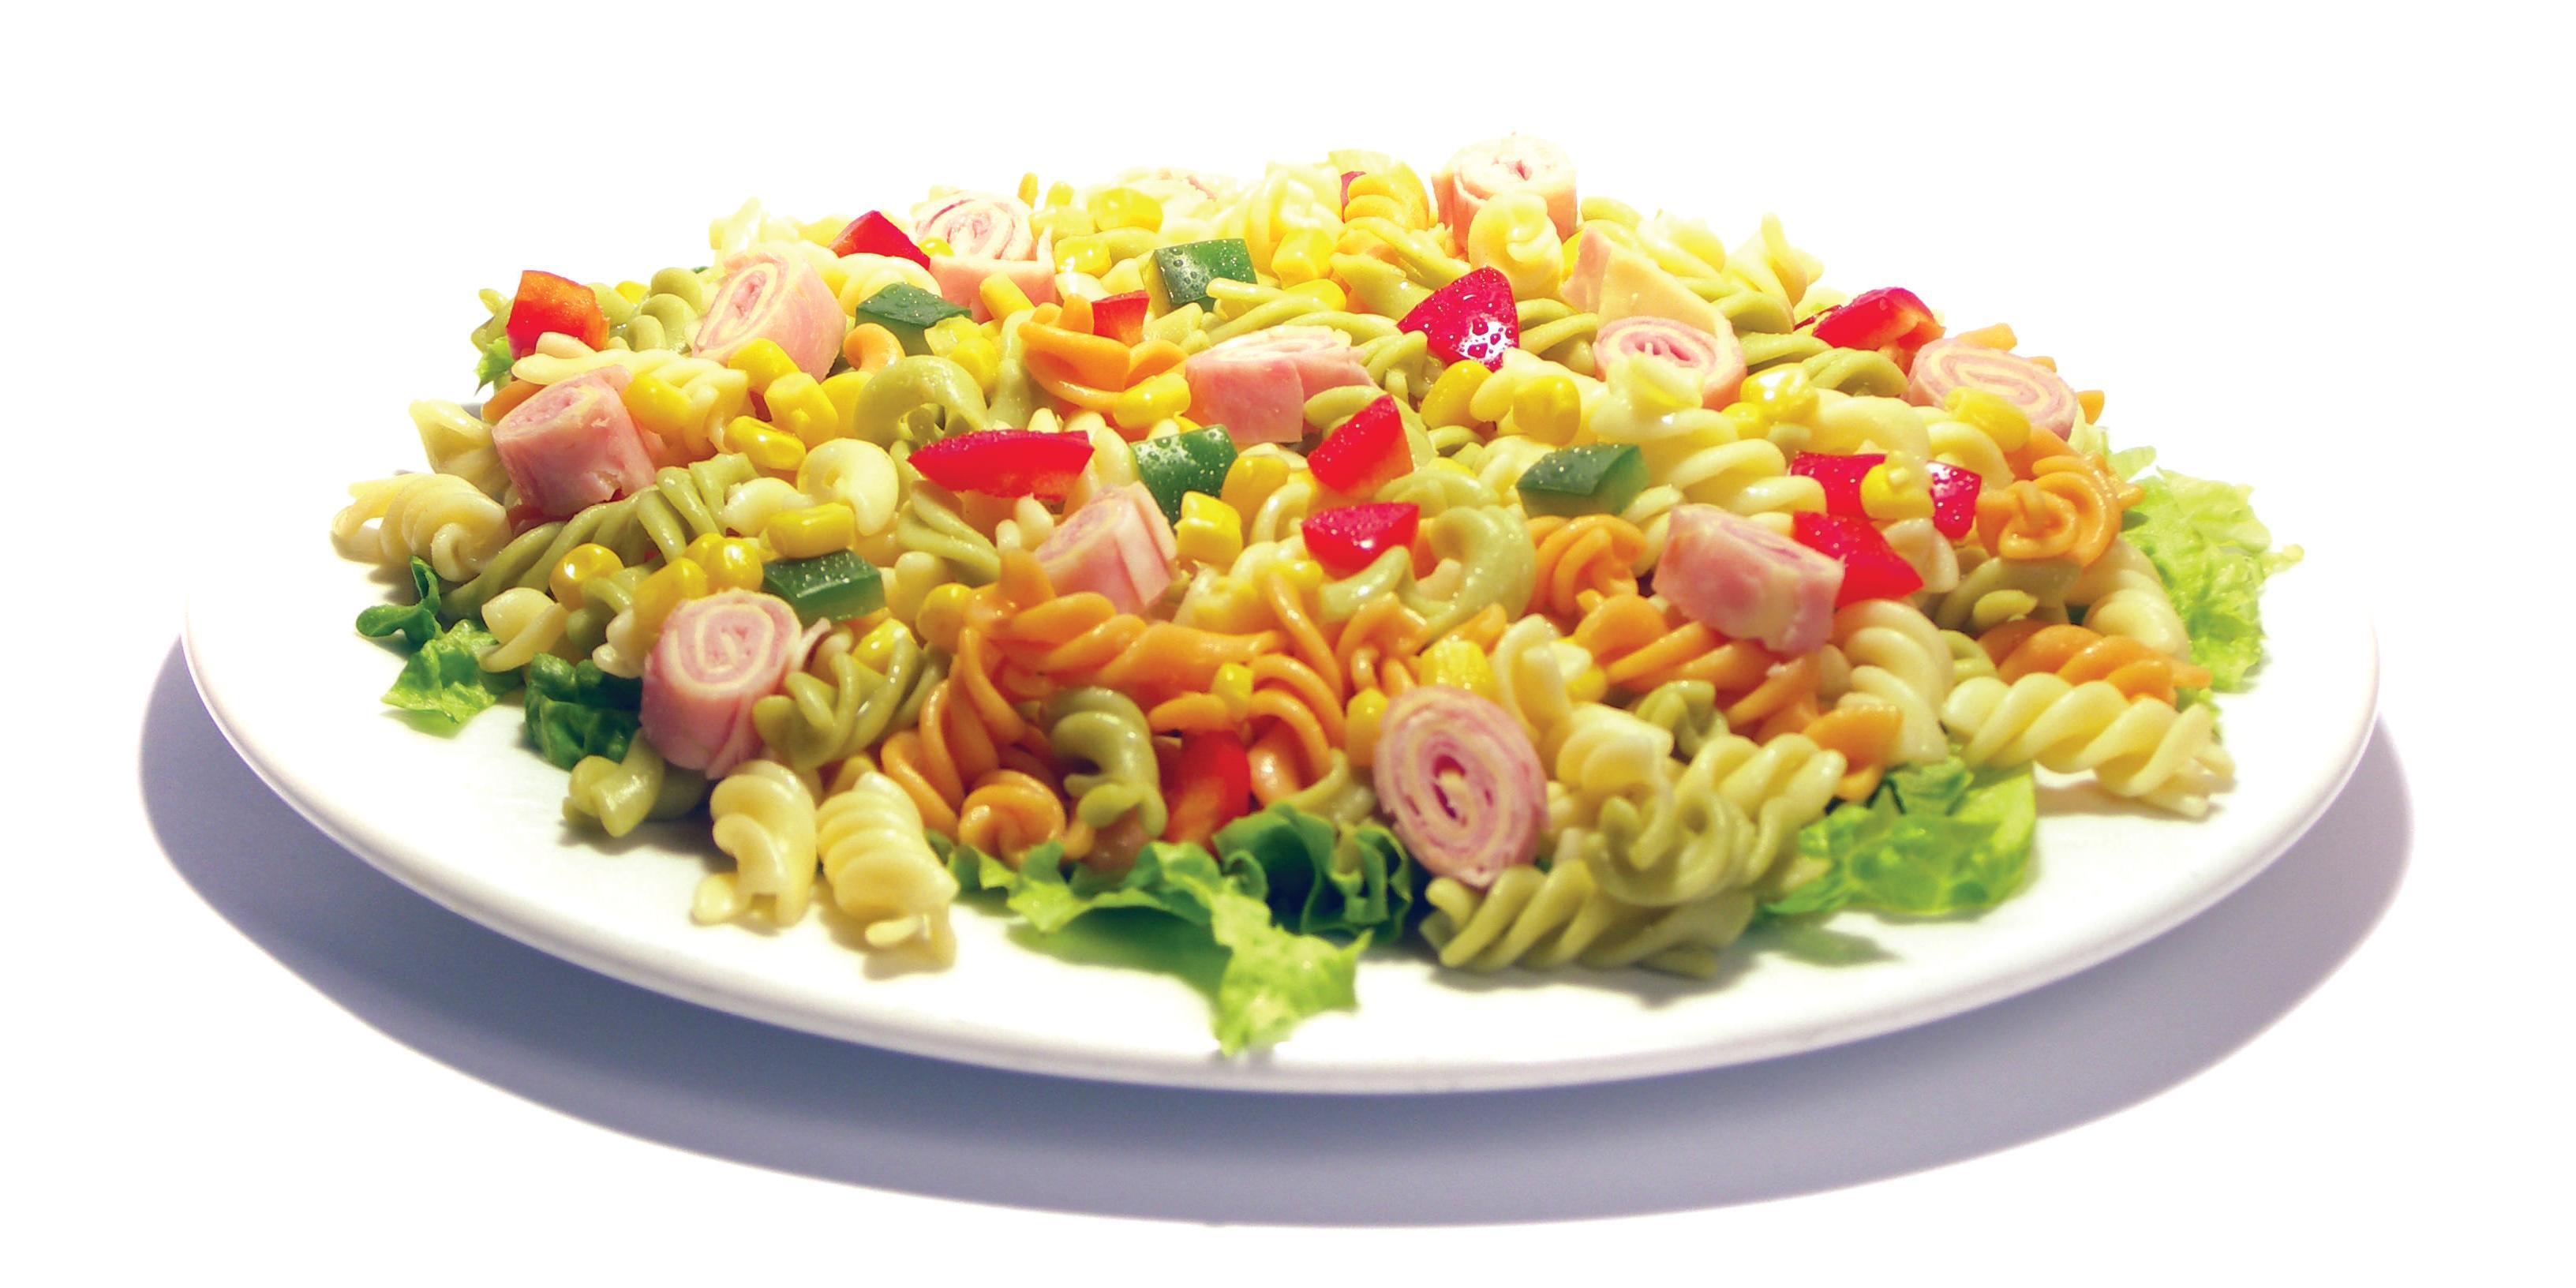 Ensalada tropical de pasta y pi a por pastas roma - Ensalada fresca de pasta ...